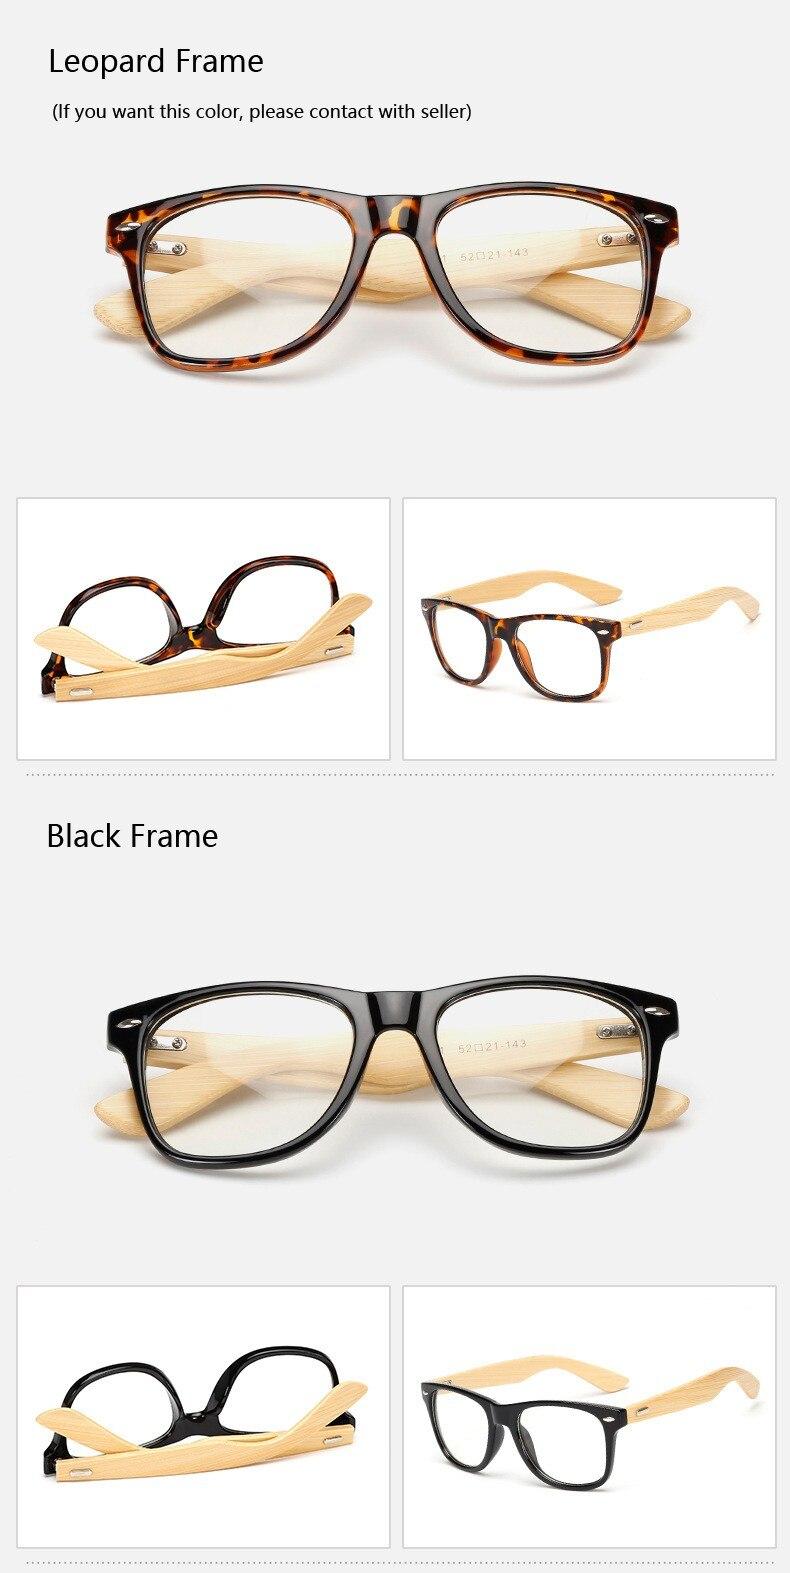 Ralferty Retro Wood Sunglasses Men Bamboo Sunglass Women Brand Design Sport Goggles Gold Mirror Sun Glasses Shades lunette oculo 16